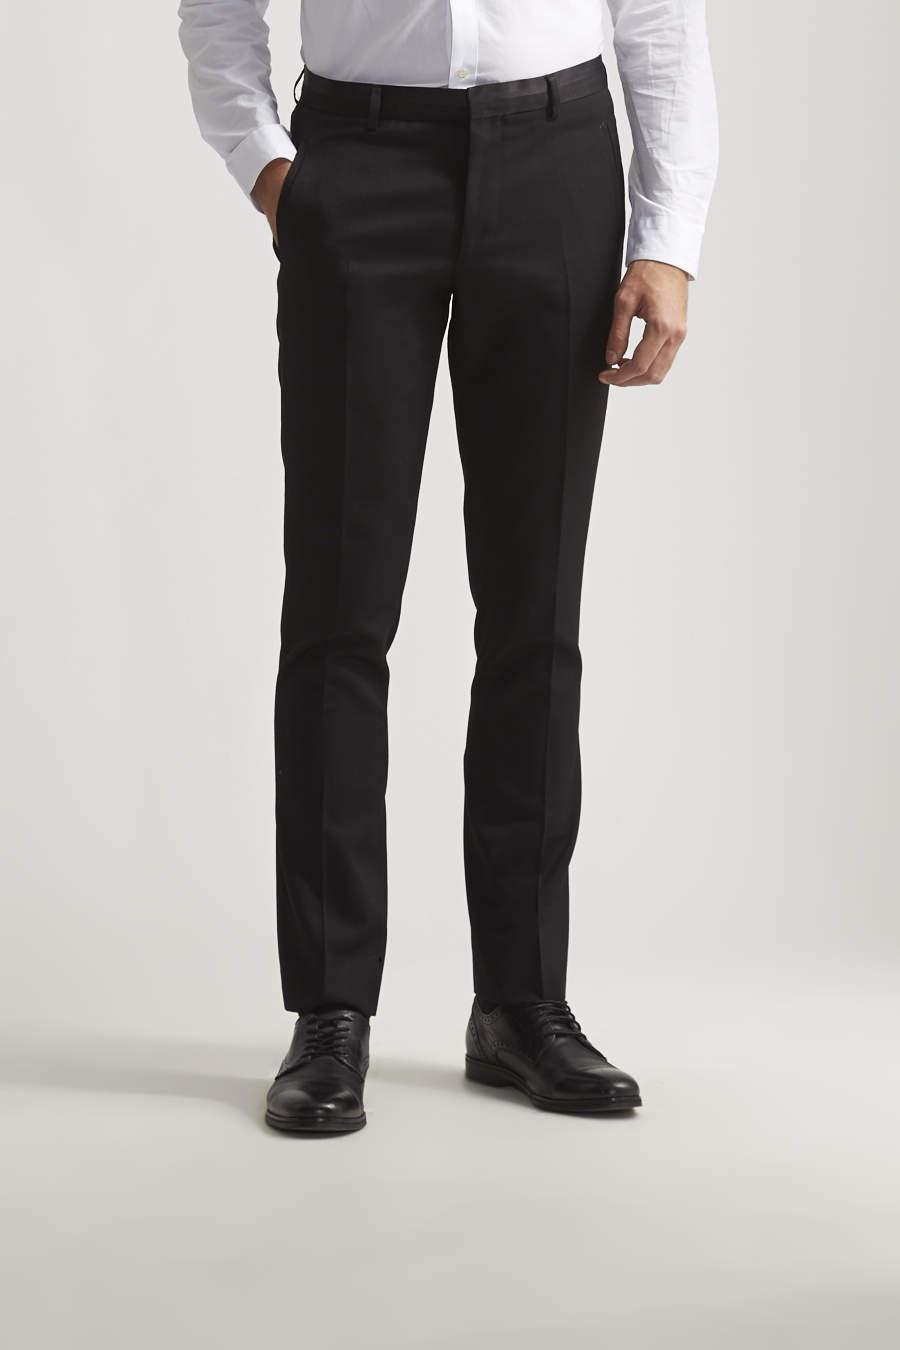 Slim black tuxedo pant